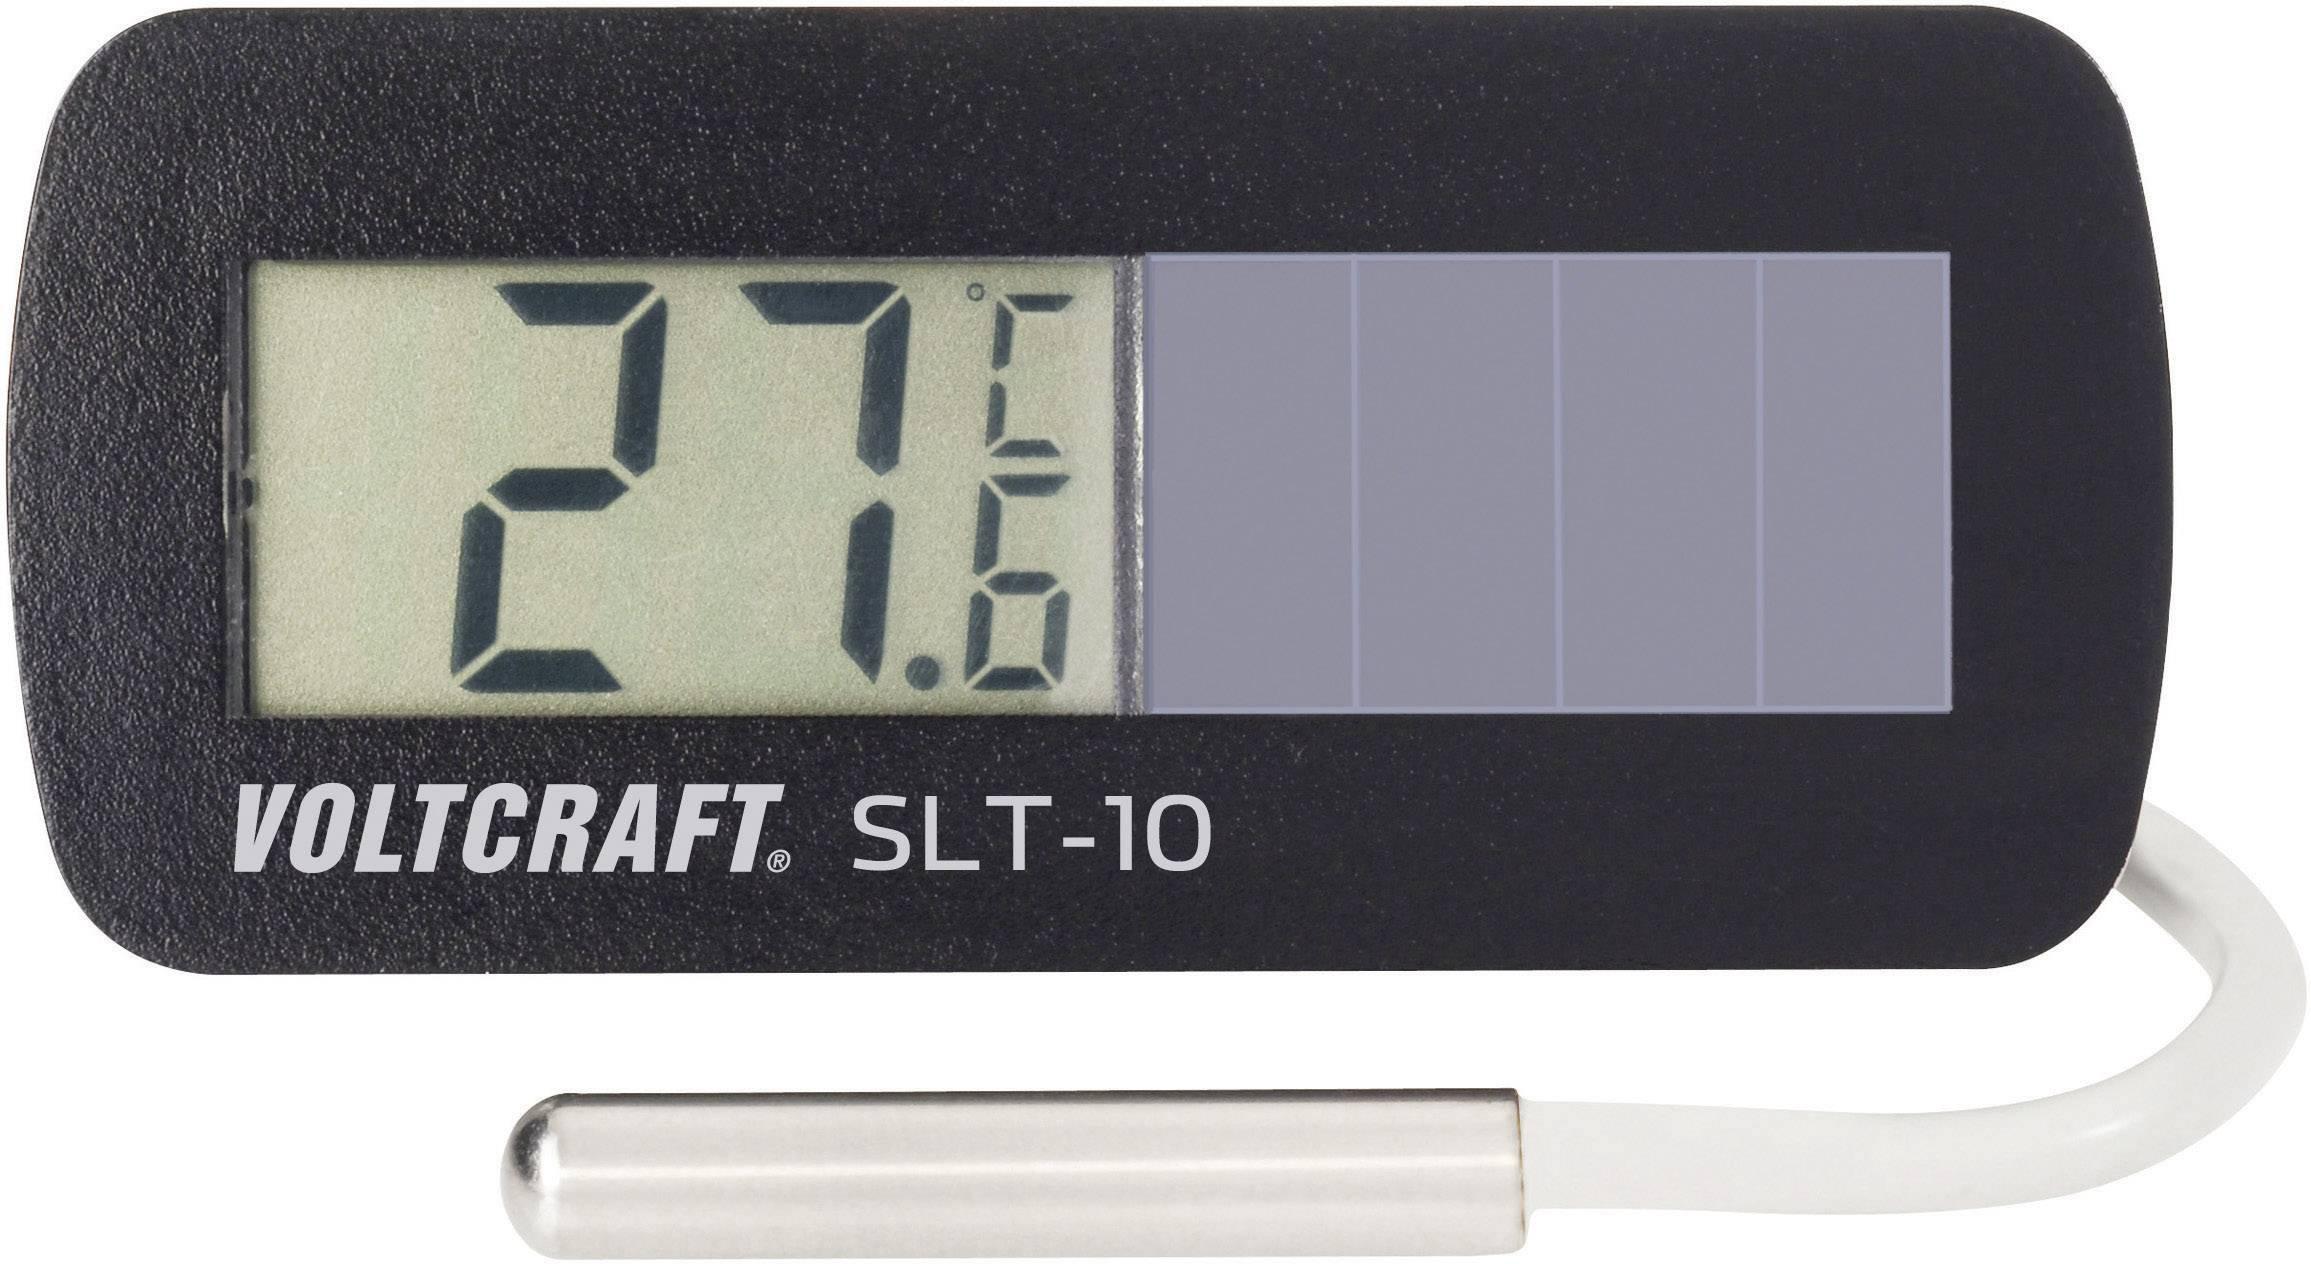 Solárny zabudovateľný teplomer Voltcraft SLT-10